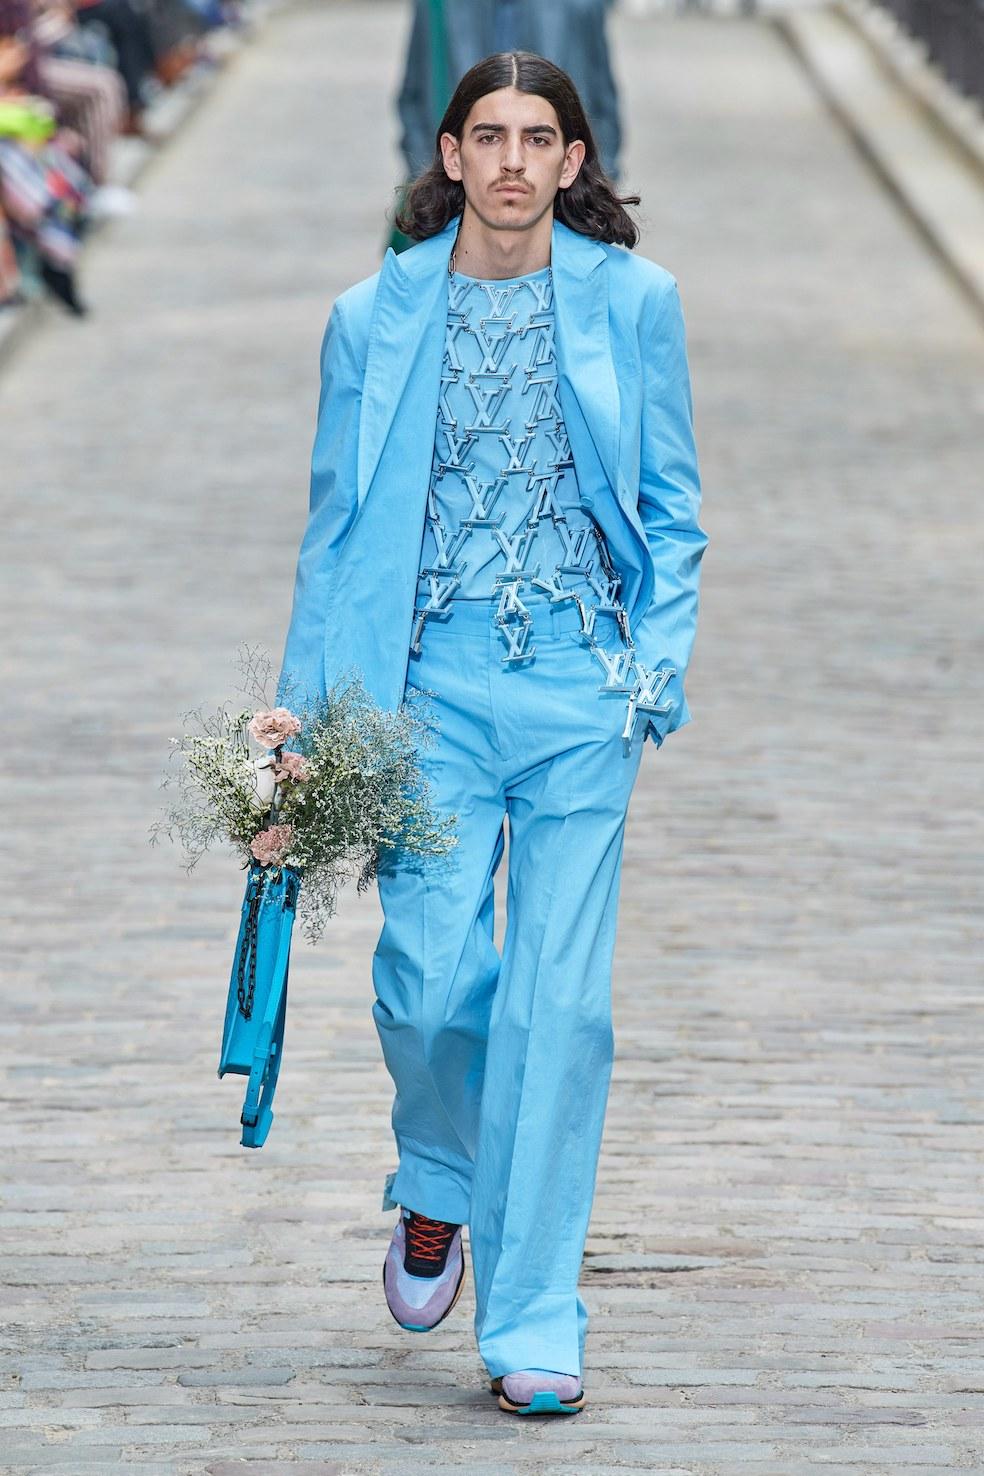 Louis_Vuitton_SS20_Behind_The_Blinds_Magazine__FIO0502.jpg